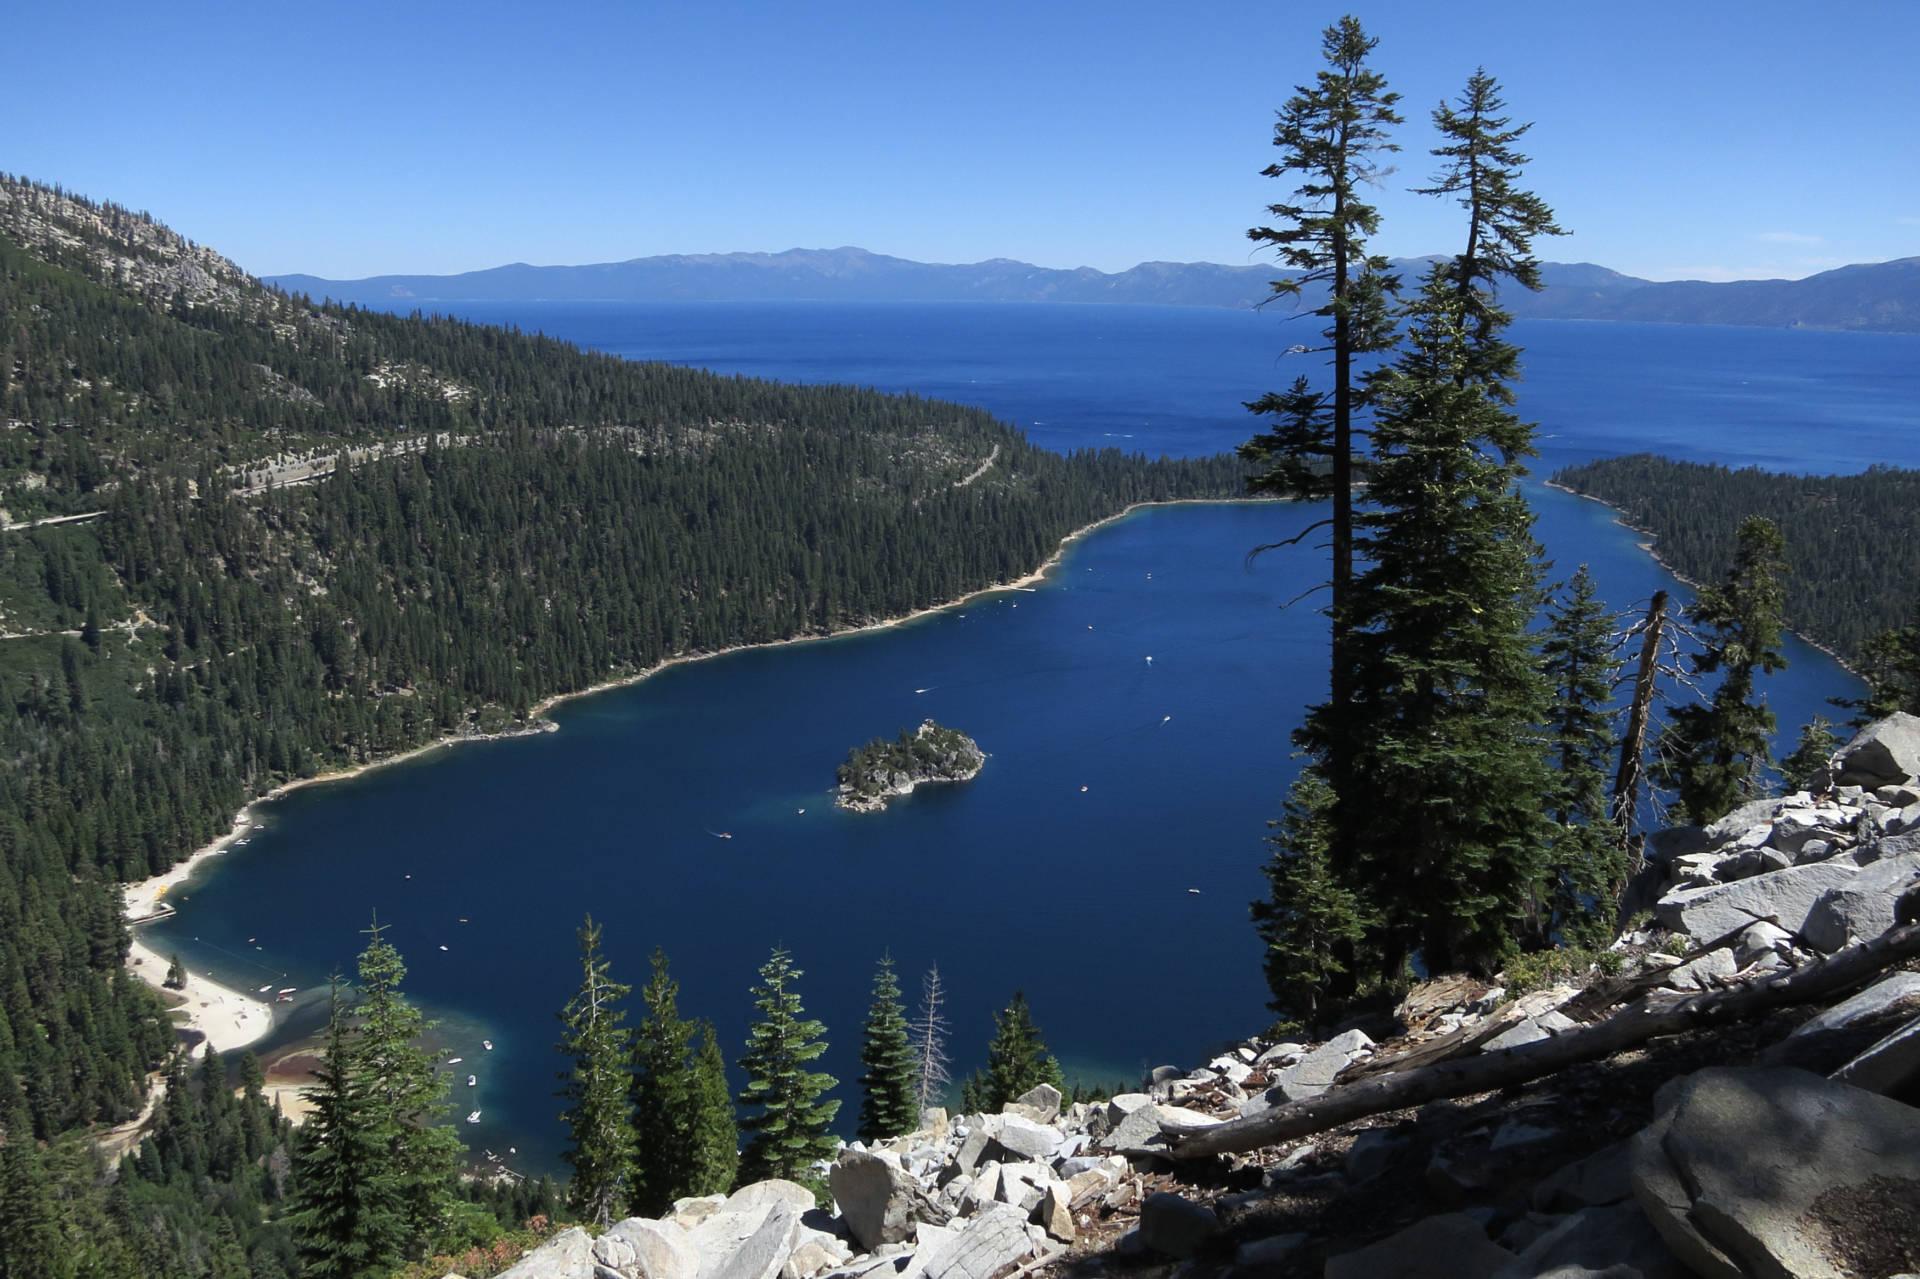 Emerald Bay lies under blue skies at Lake Tahoe. Sean Gallup/Getty Images